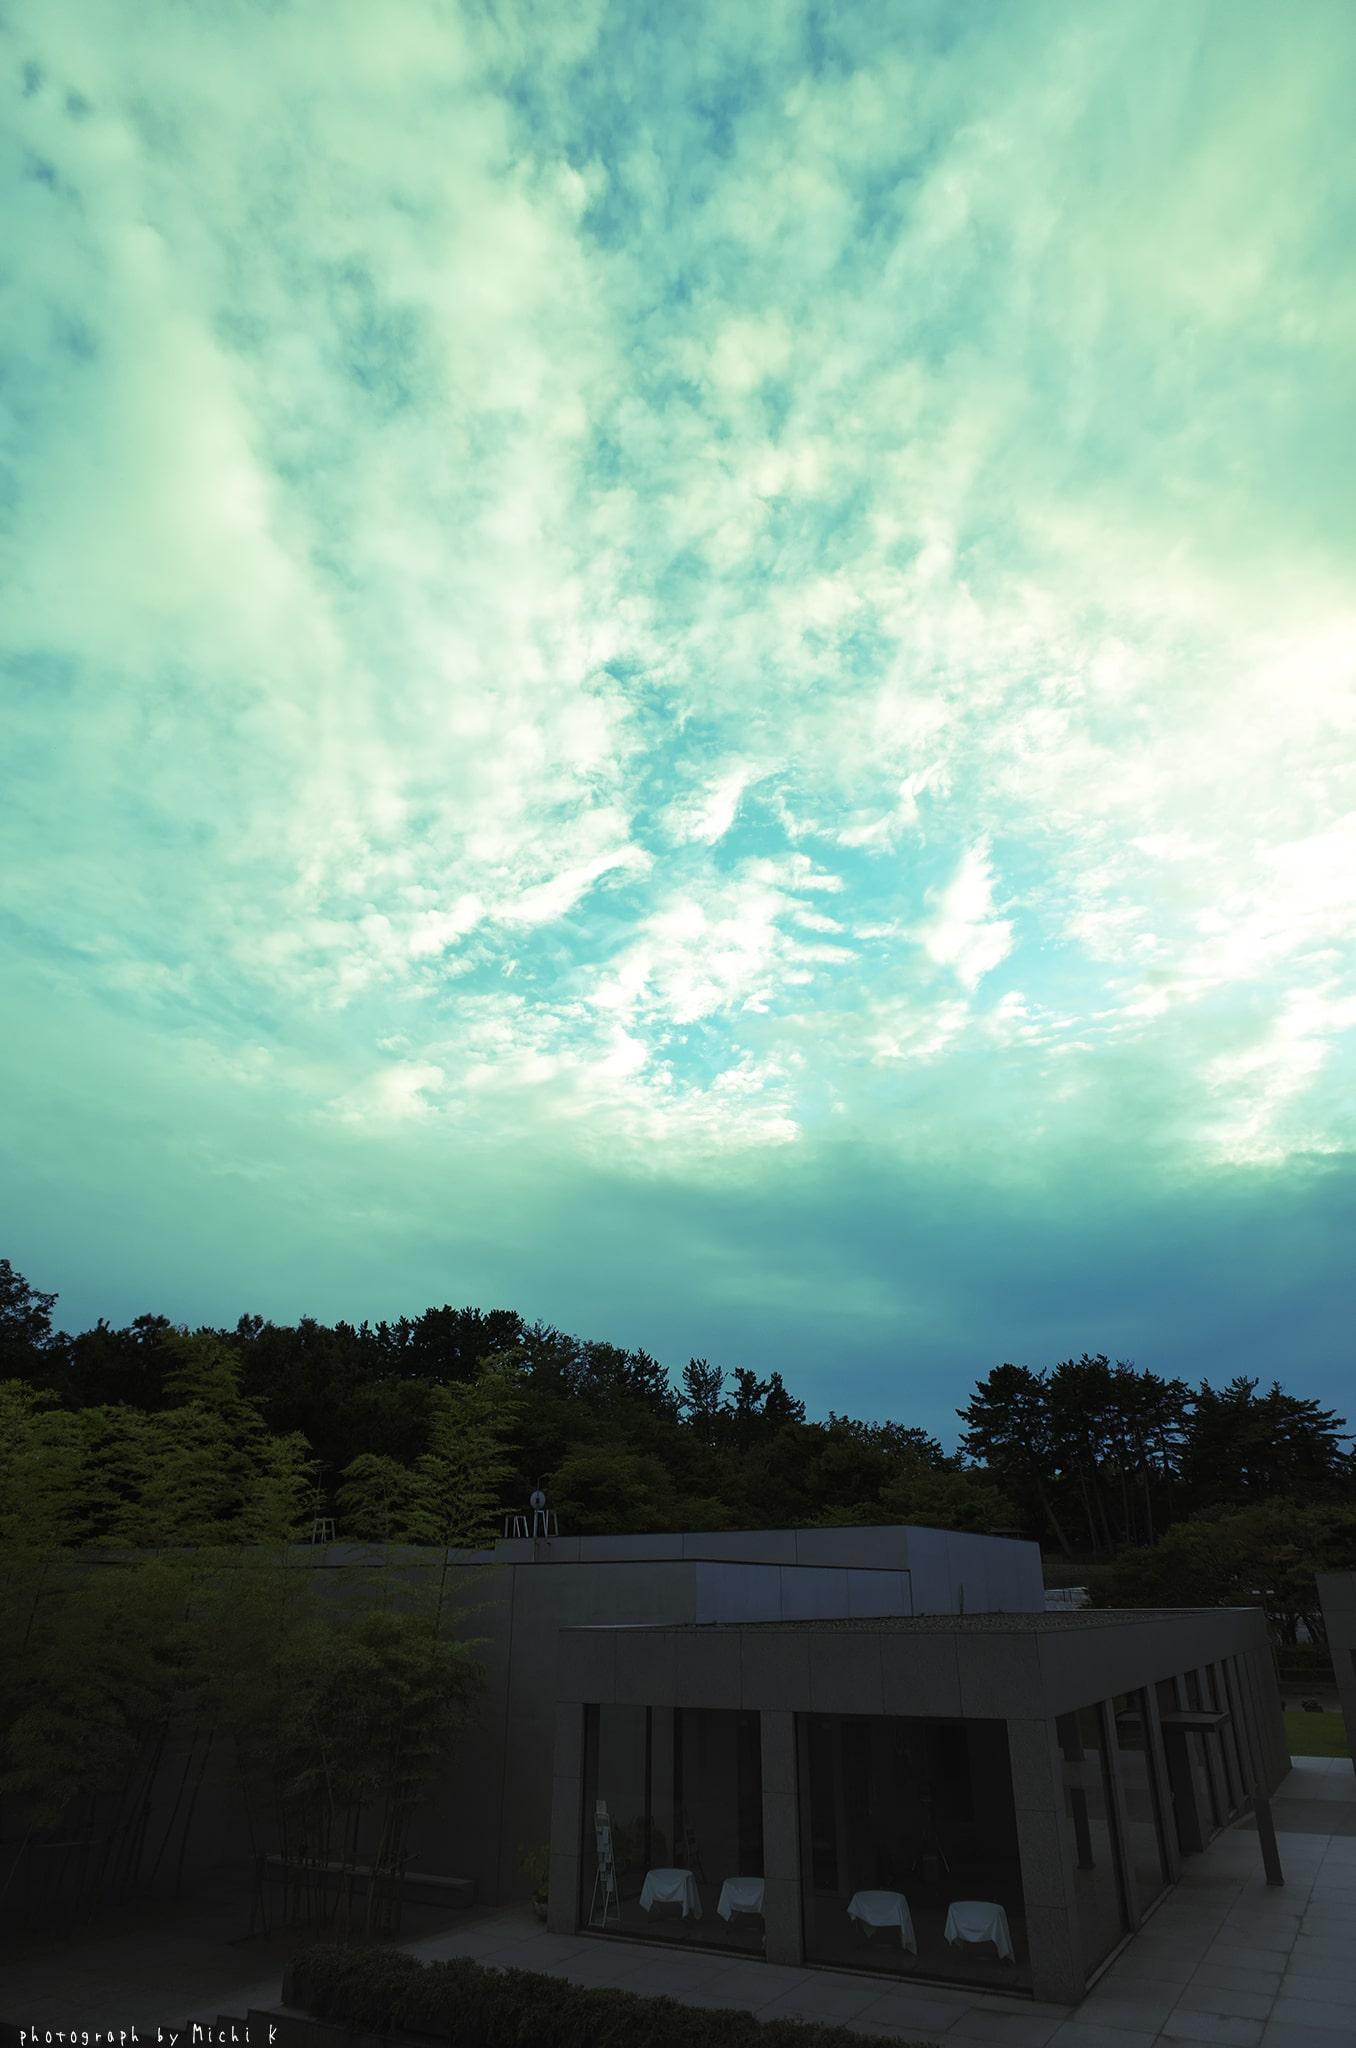 土門拳記念館2019-9-21夕方(写真その2)